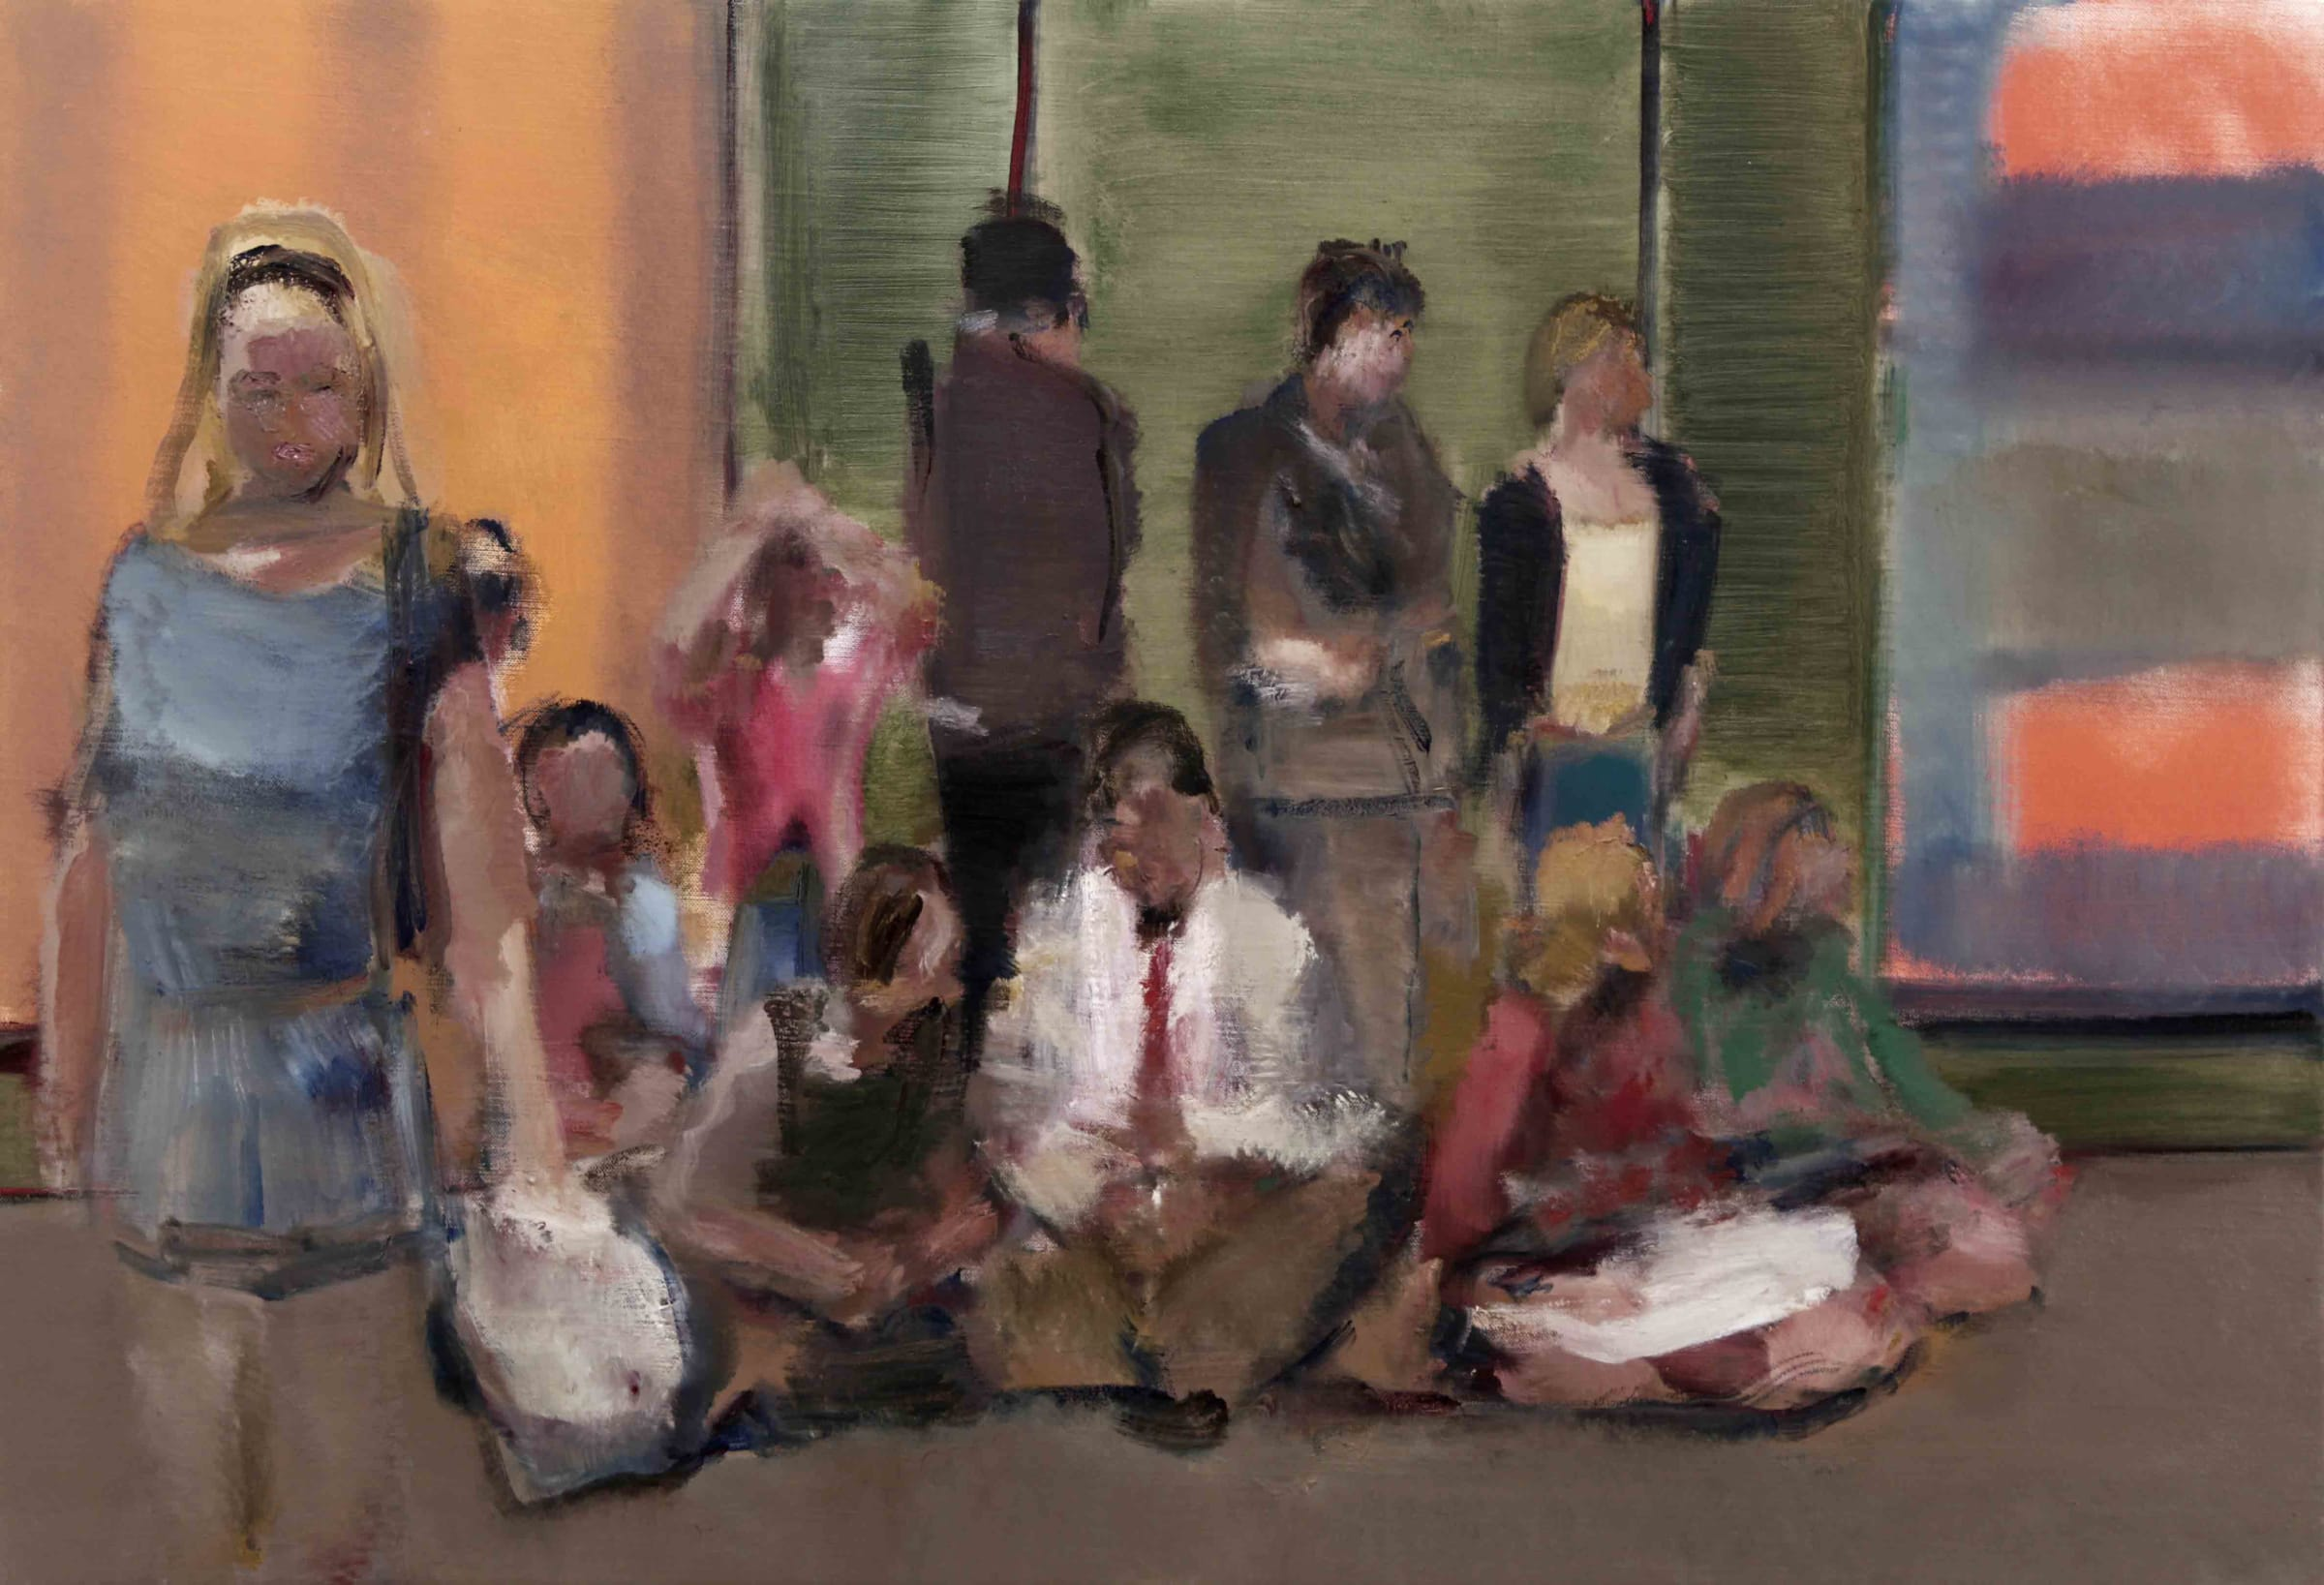 "<span class=""link fancybox-details-link""><a href=""/artists/59-simon-nicholas/works/265-simon-nicholas-gallery-group-1/"">View Detail Page</a></span><div class=""artist""><strong>Simon Nicholas</strong></div> <div class=""title""><em>Gallery Group 1</em></div> <div class=""medium"">Acrylic on Linen</div> <div class=""dimensions"">26 x 38 inches</div>"